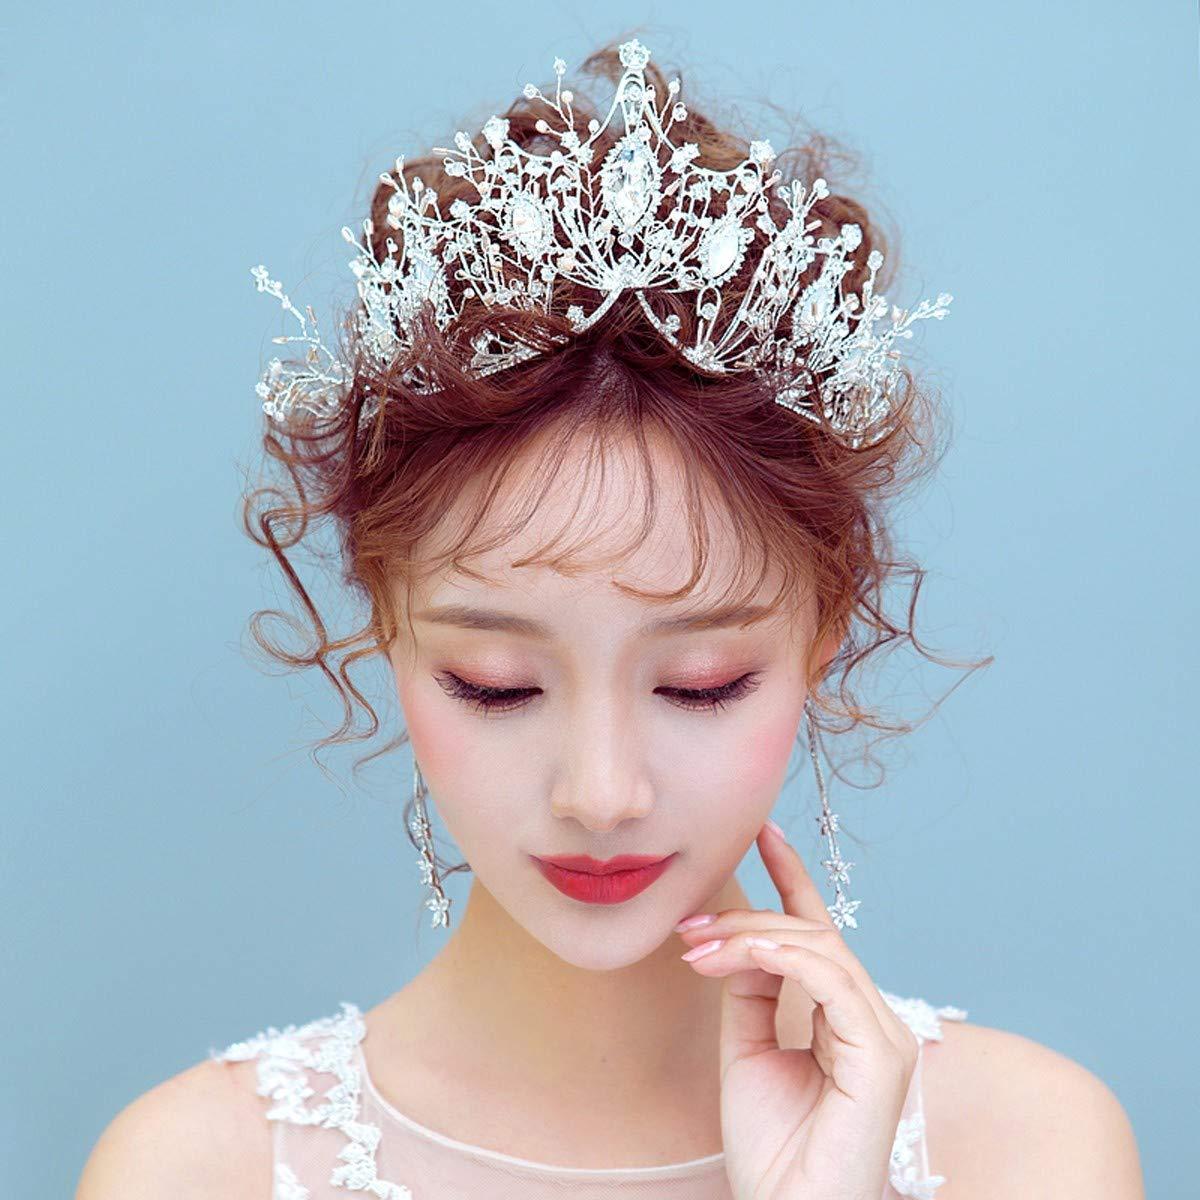 Girls Crown, Beautiful headdress/Bridal Crown Accessories Crown 2 Wedding Accessories by Zehaer (Image #4)